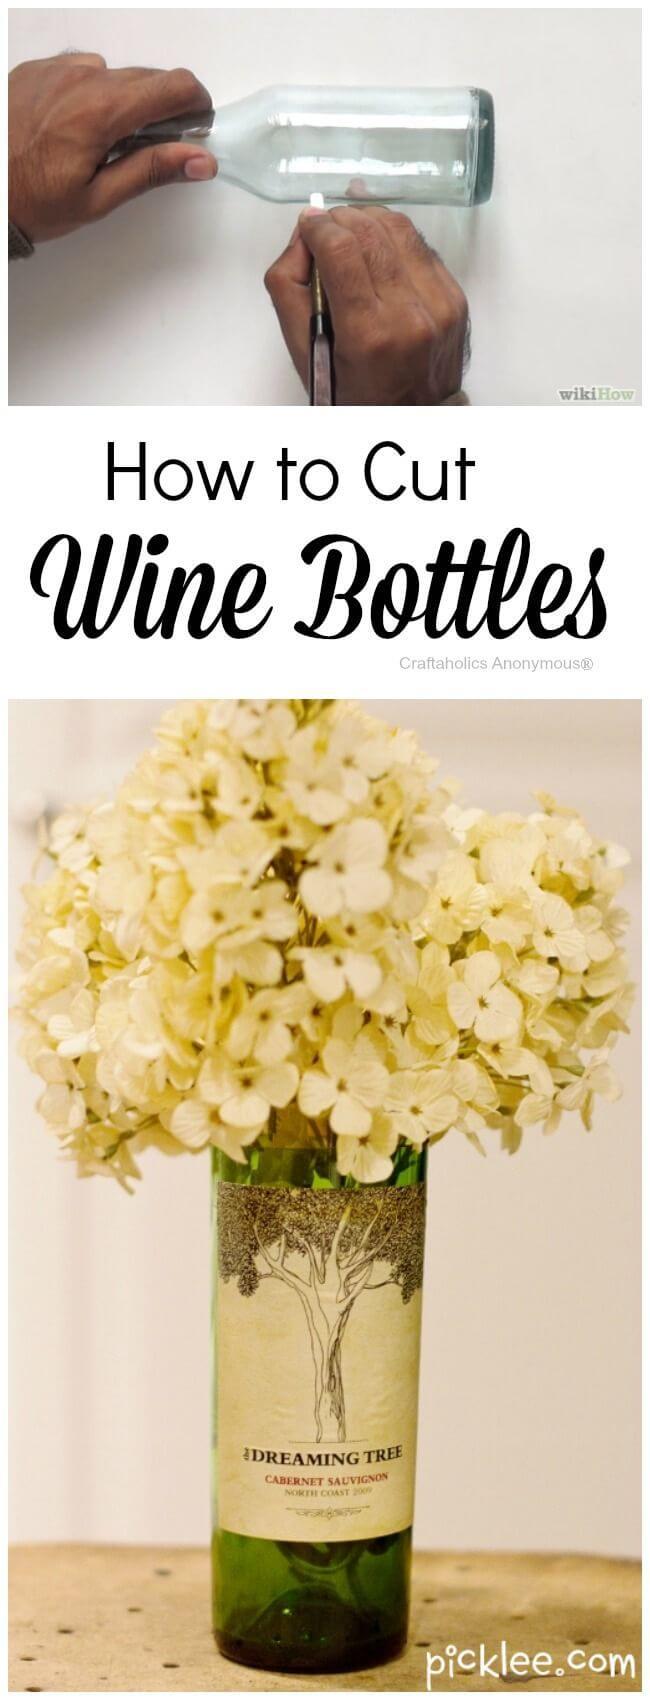 manualidades para reciclar botellas de vino 17